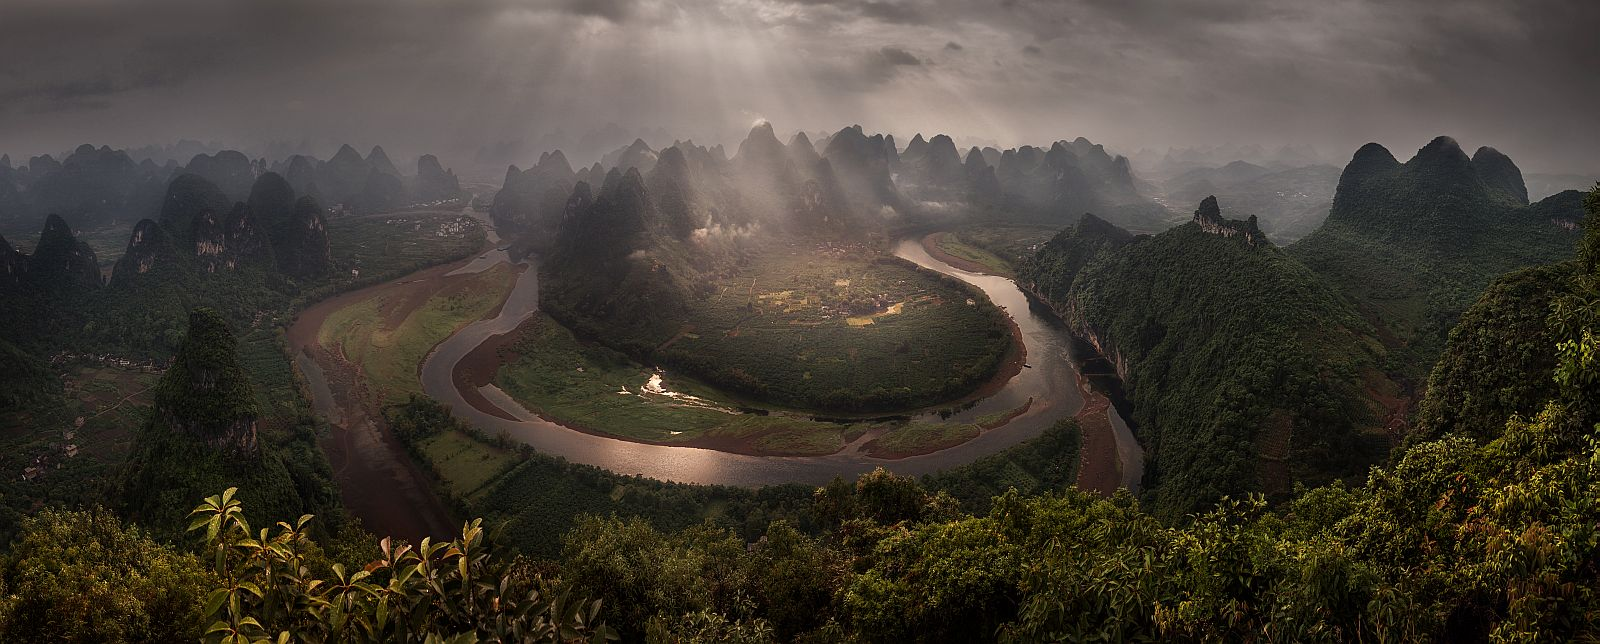 «Райське місце». Перше місце в «Special panoramic». Фото: Valeriy Shcherbina